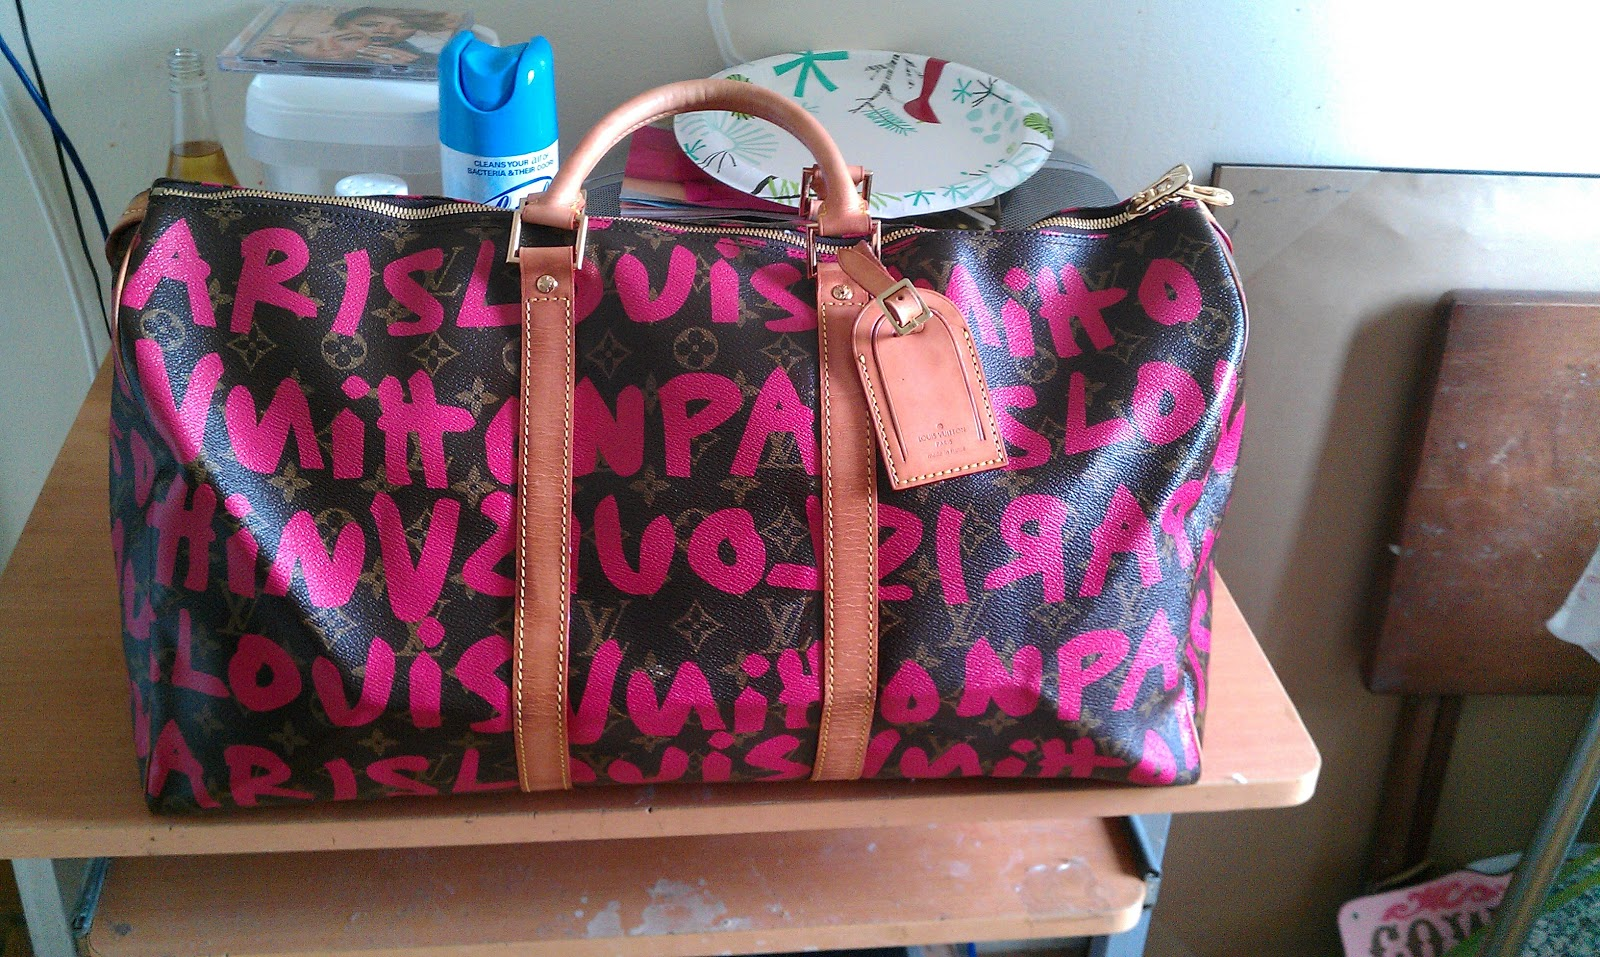 Louis Vuitton Graffiti Bag Replica Ahoy Comics